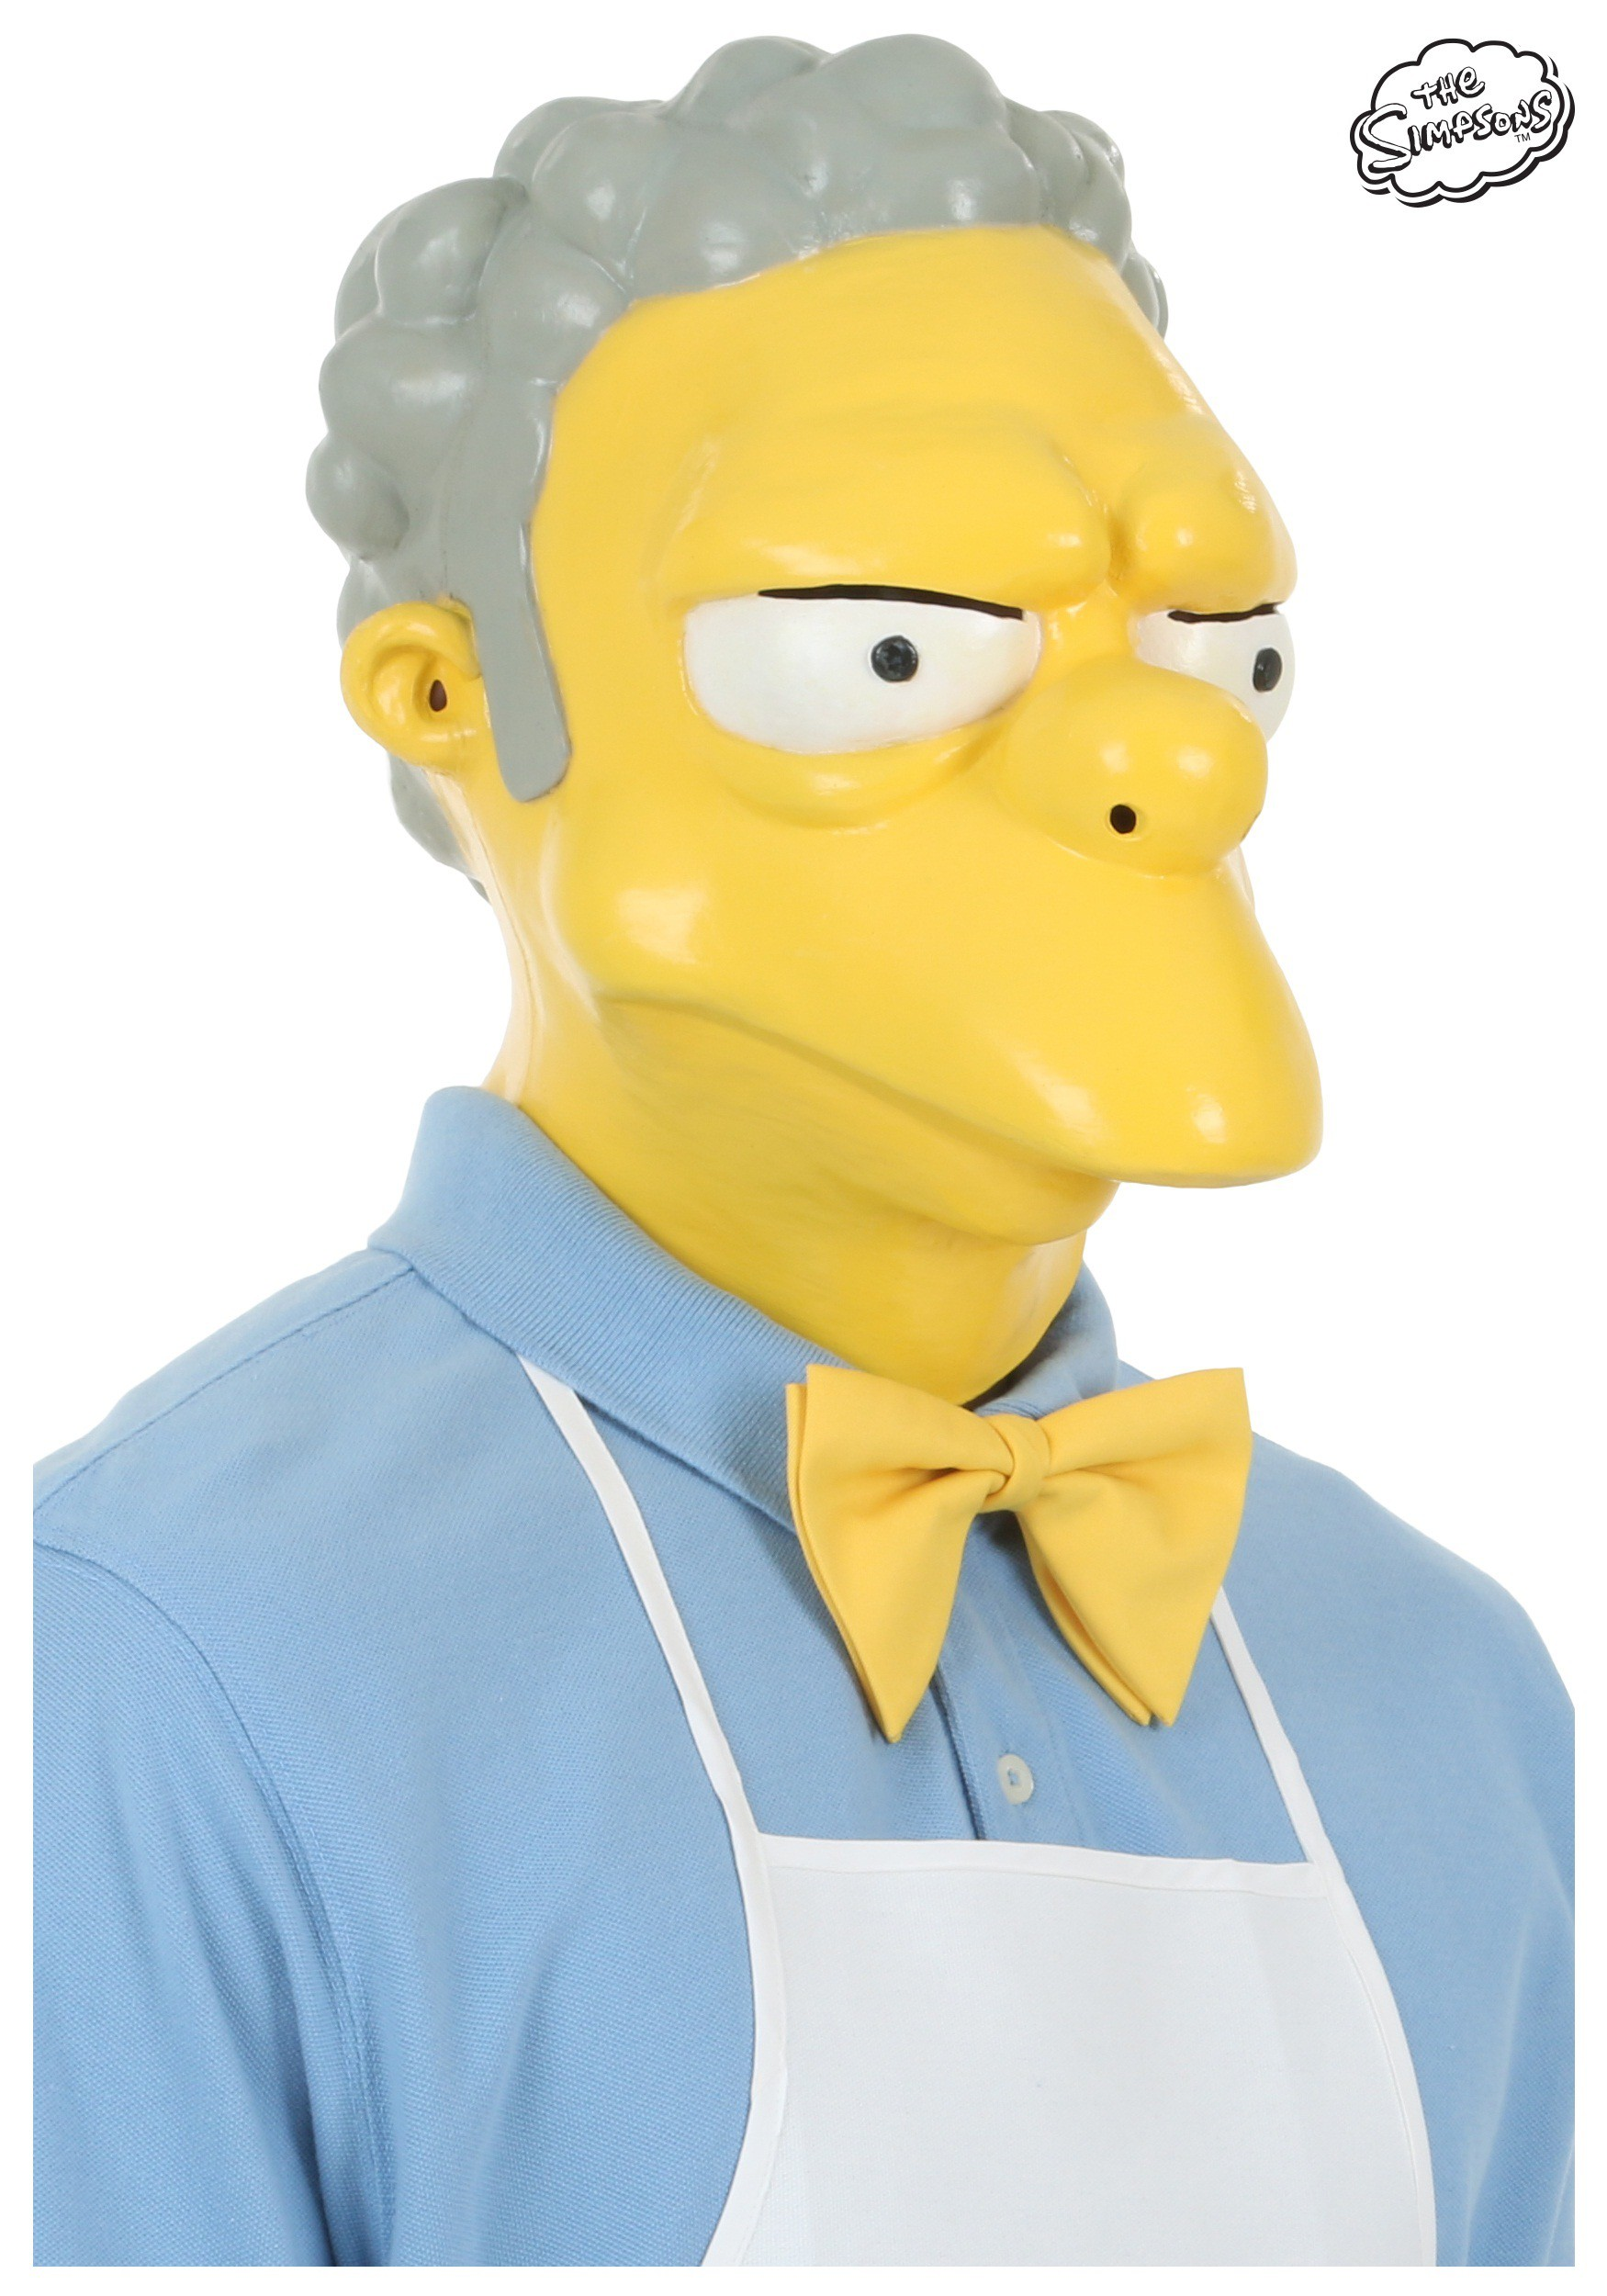 Halloween decorations indoor - The Simpsons Moe Szyslak Mask